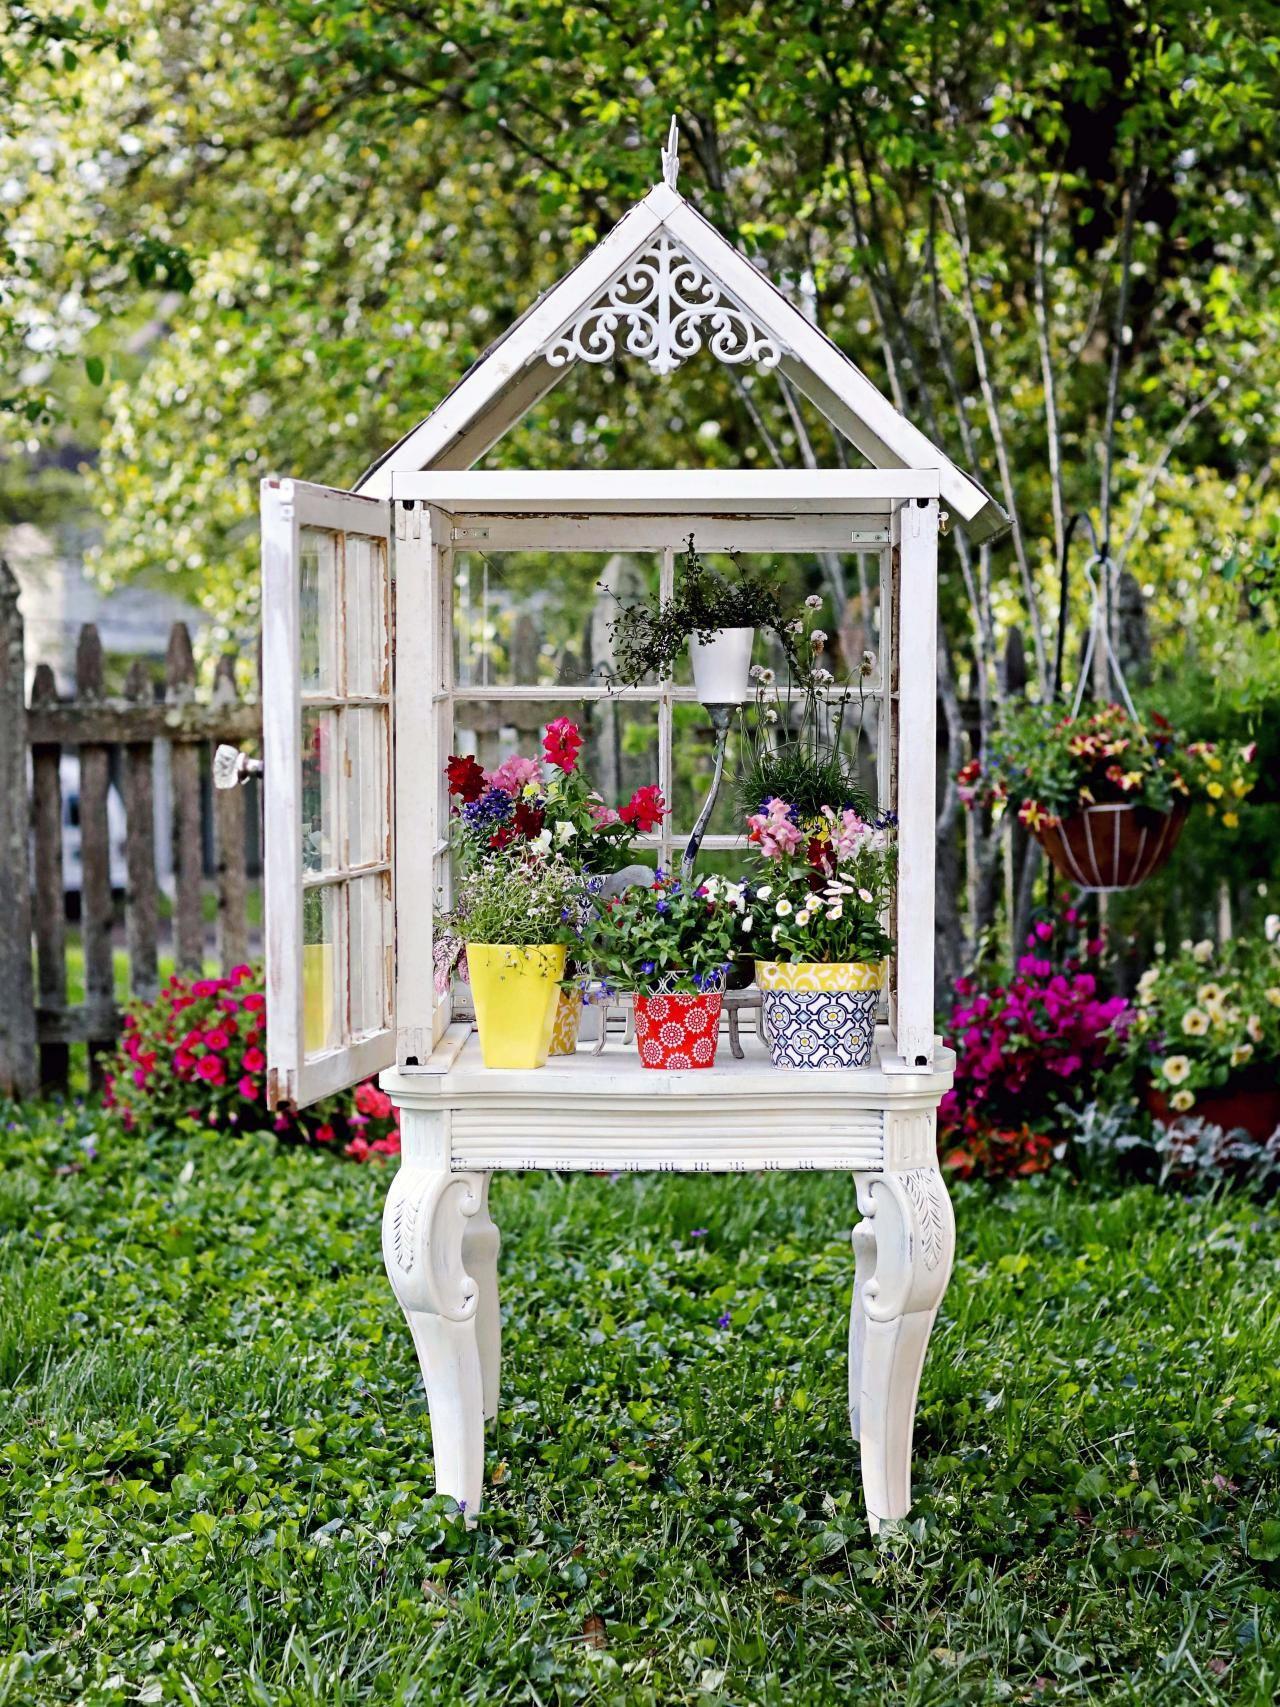 Turn a Window into a Mini Greenhouse